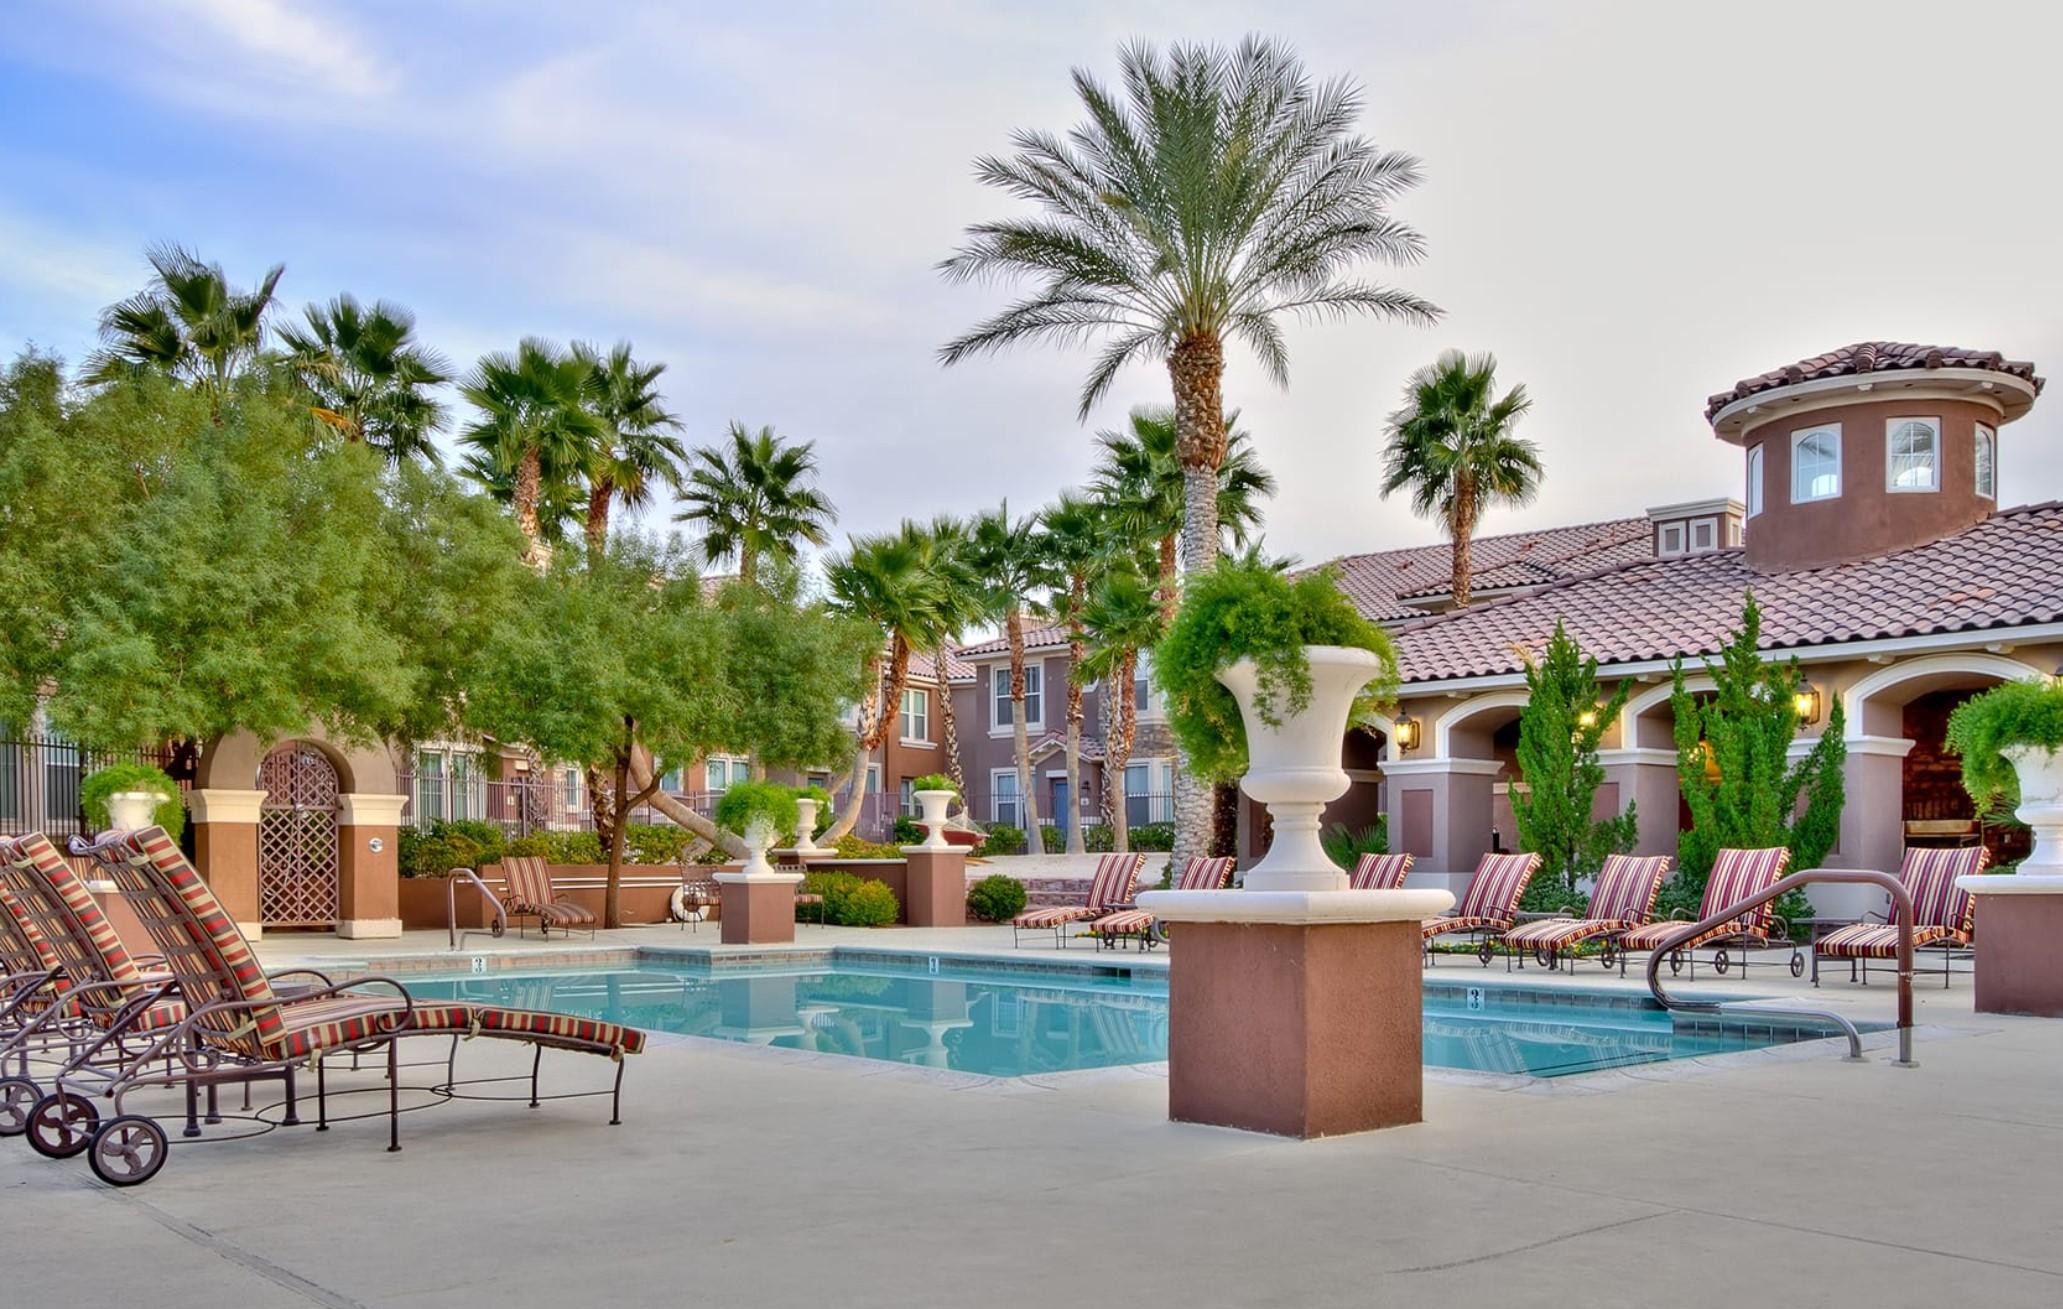 Tesora Apartments $31,013,200 223(f) Las Vegas, NV 231 units February 2019